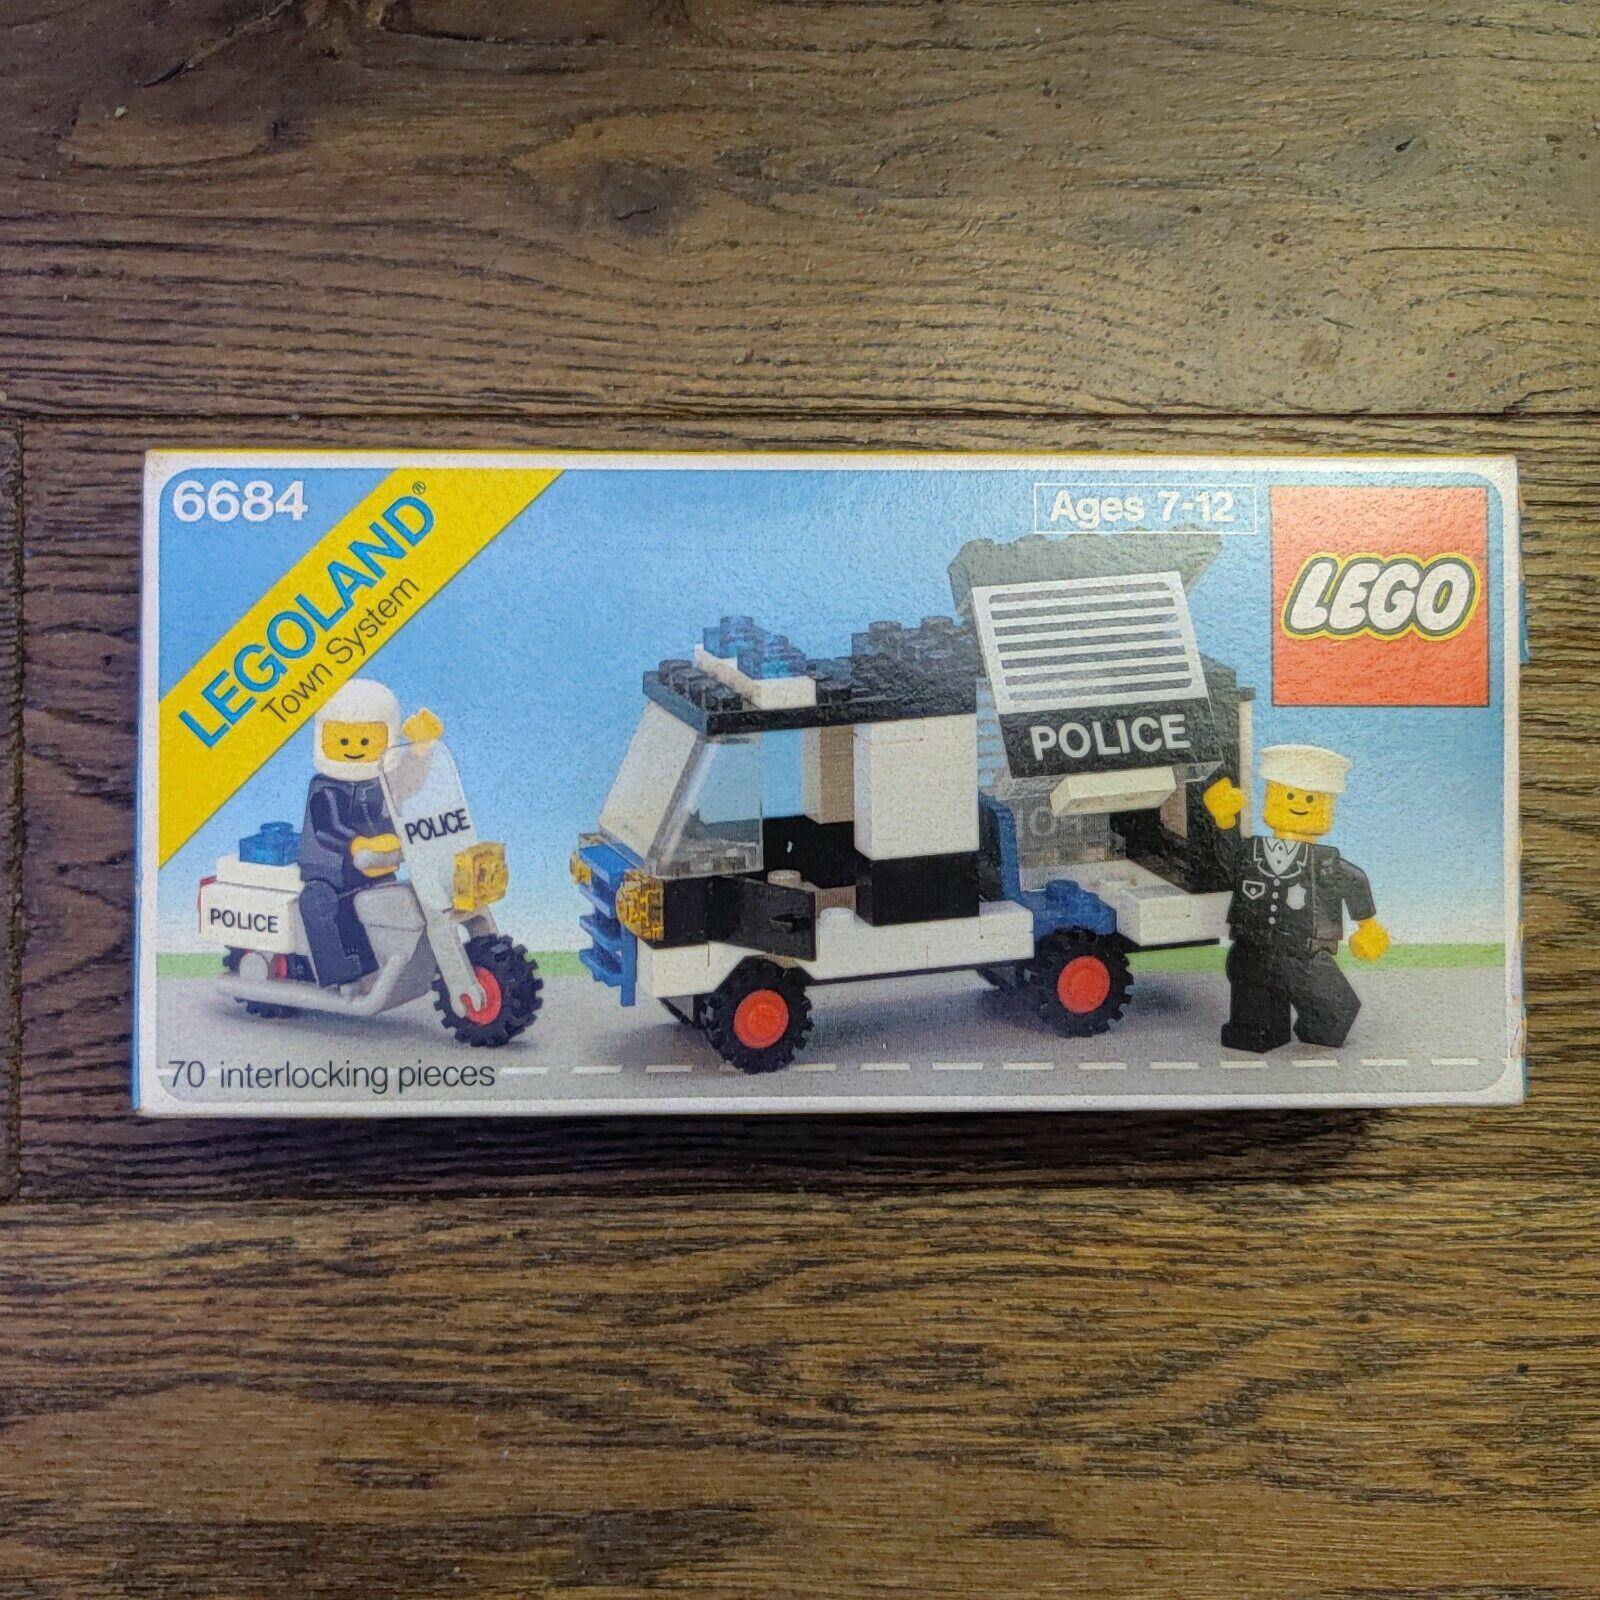 Set  6684 Police Patrol Squad LEGO POLICE panel ref 4215apx2